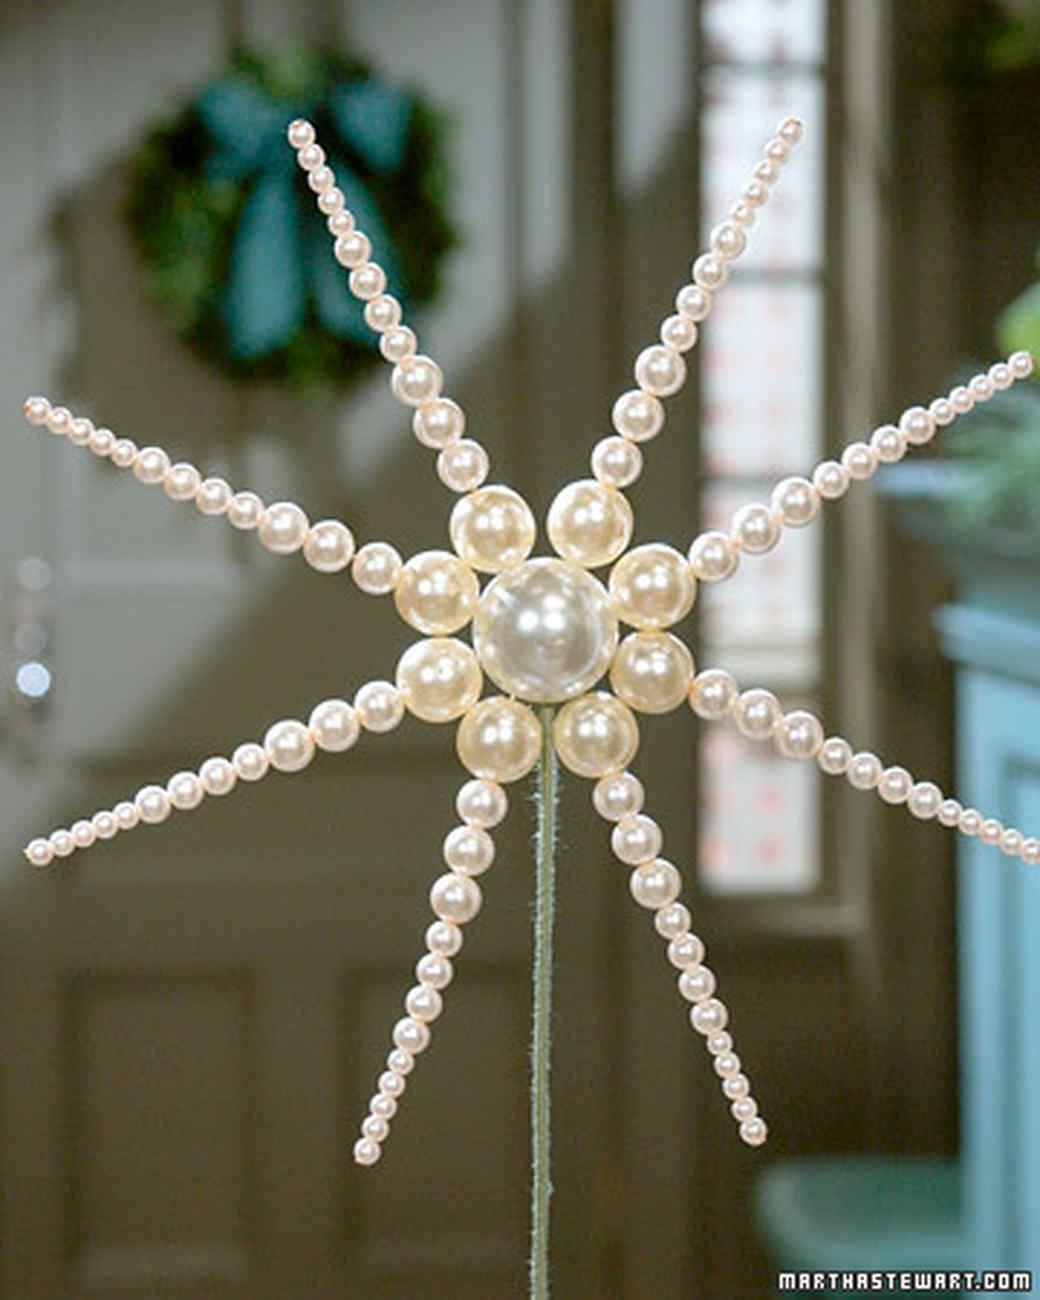 Martha Stewart Christmas Tree Topper: 10 DIY Tree Toppers For Christmas